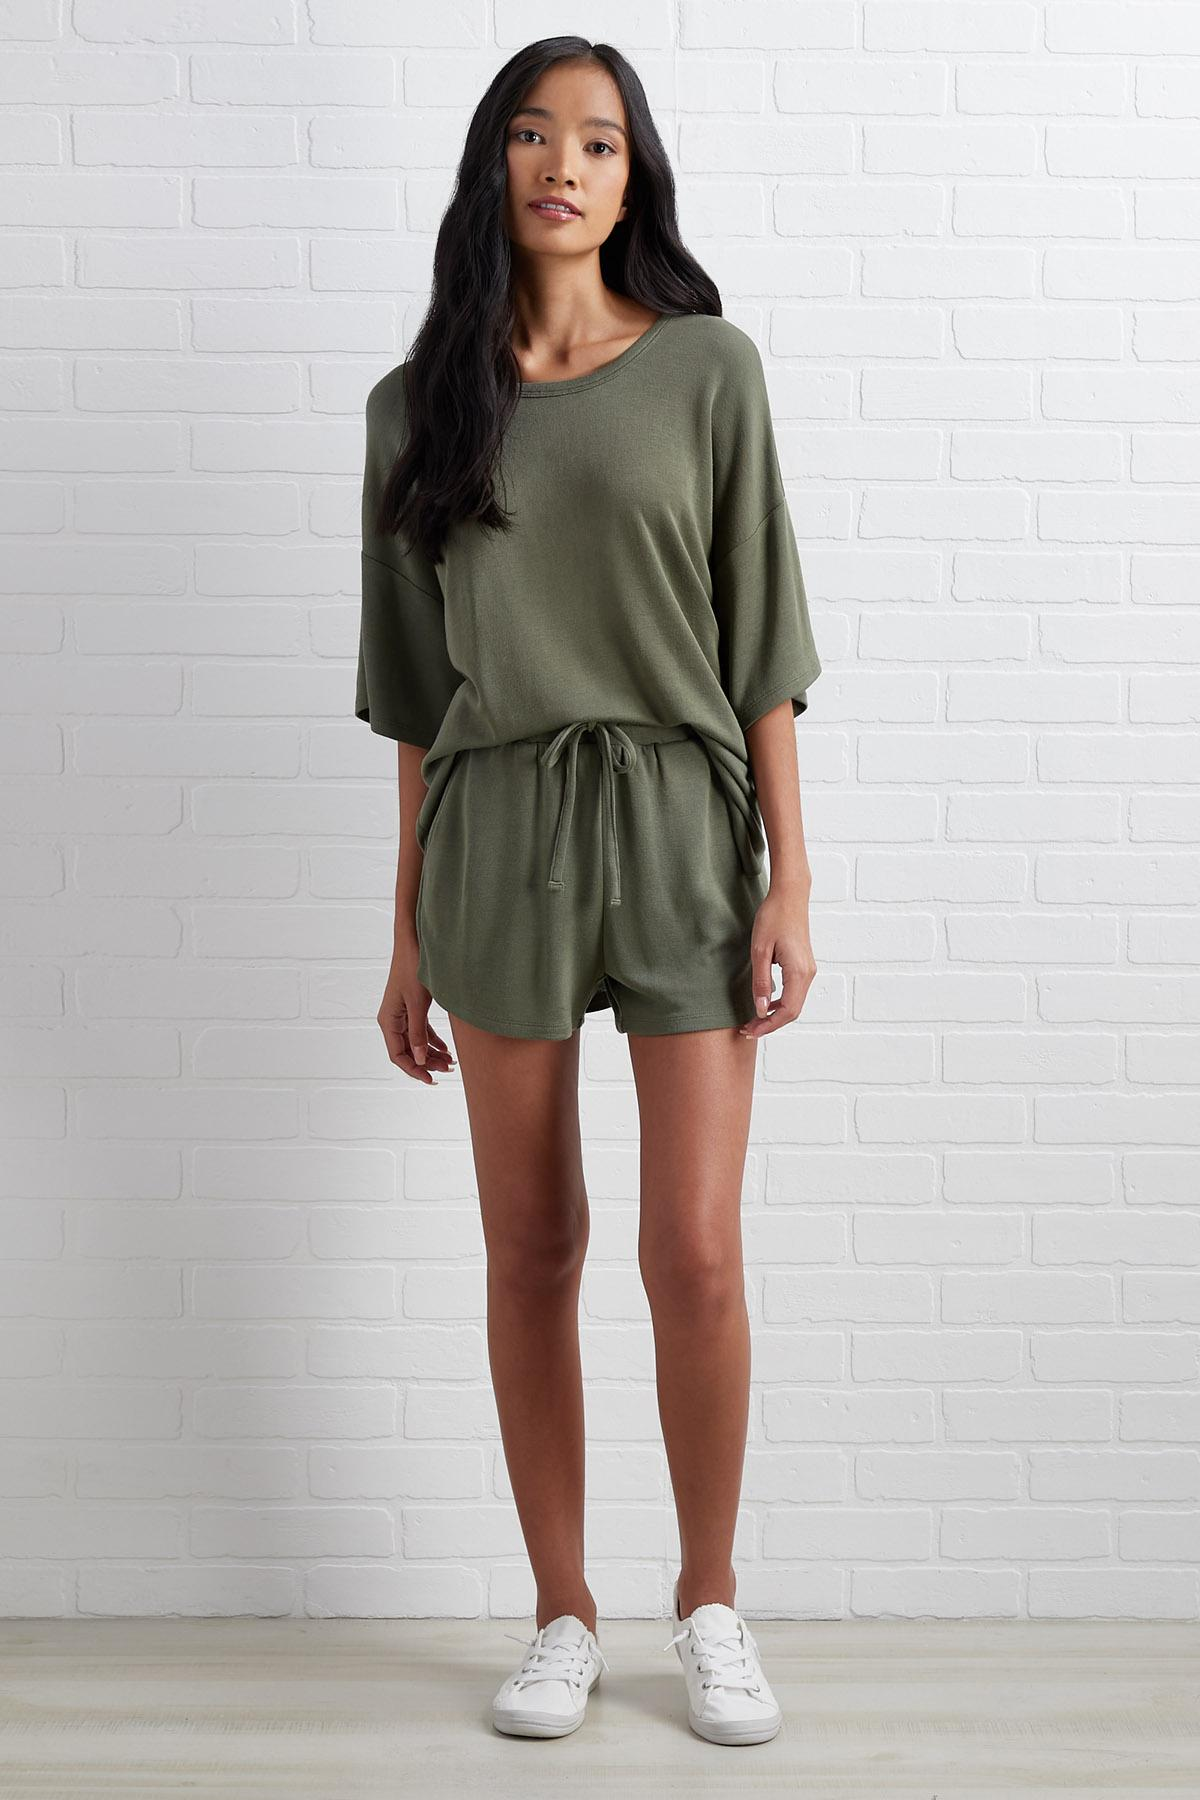 Going Green Shorts